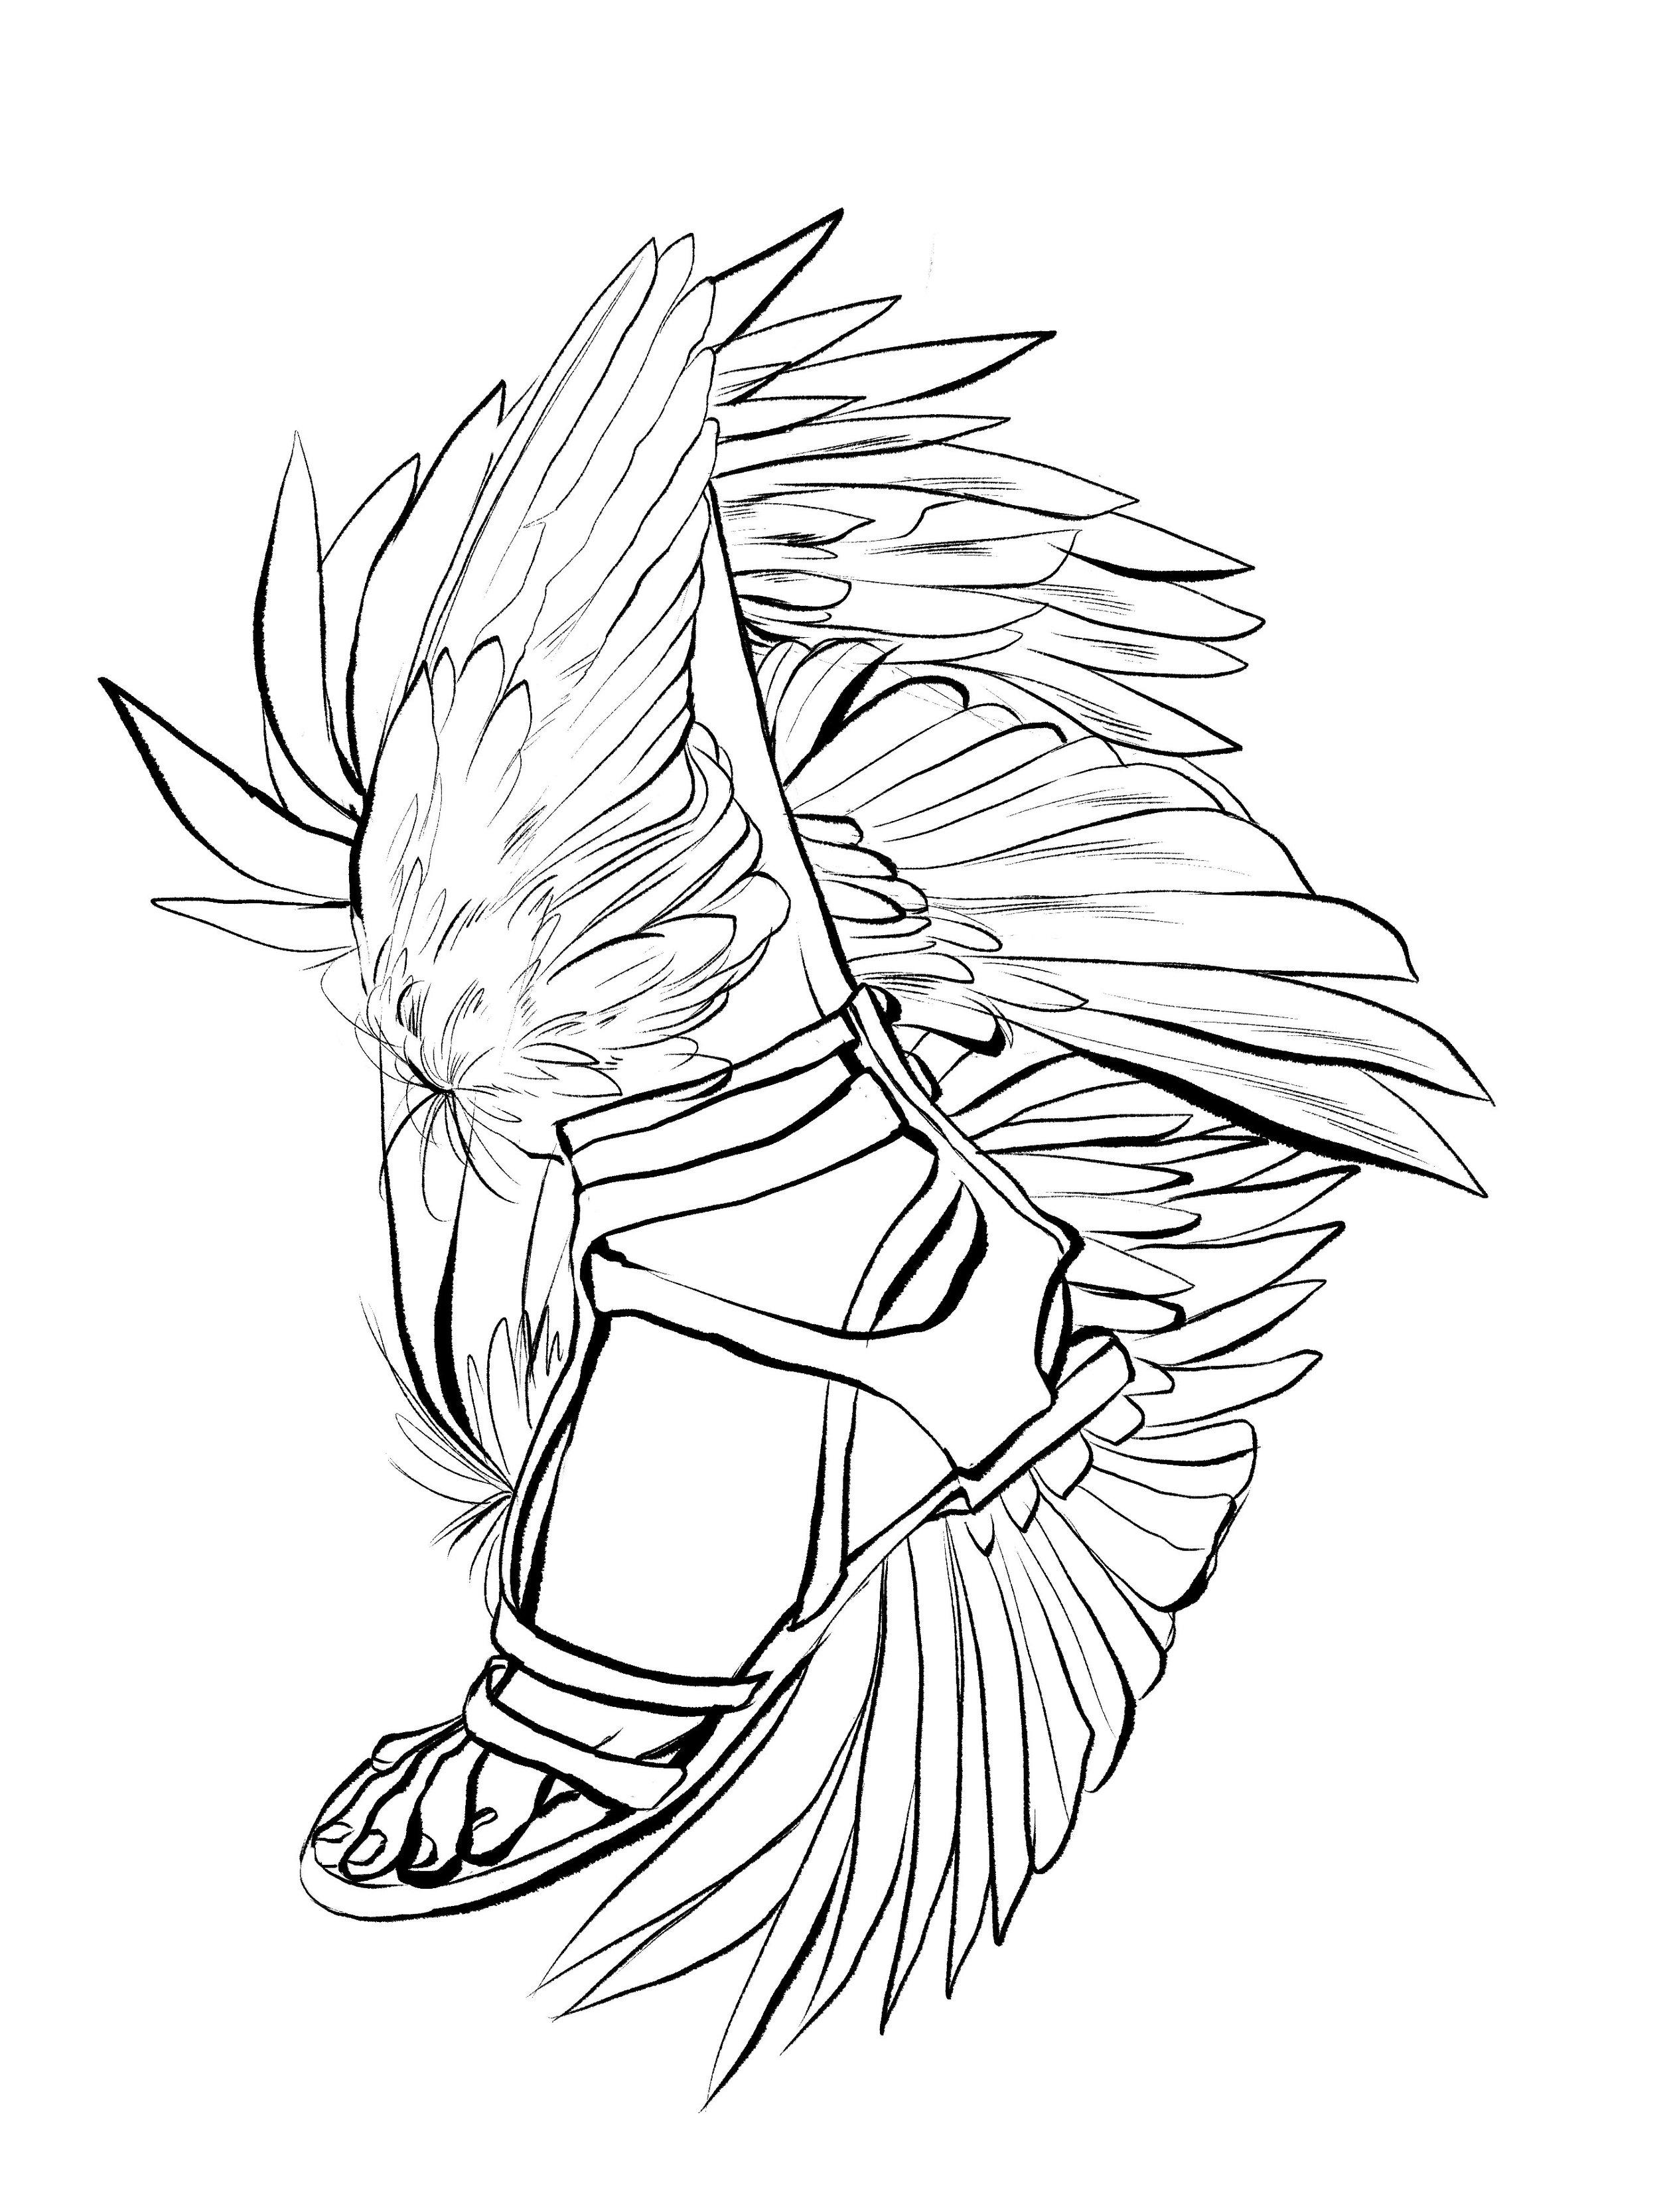 Hermes' Flight